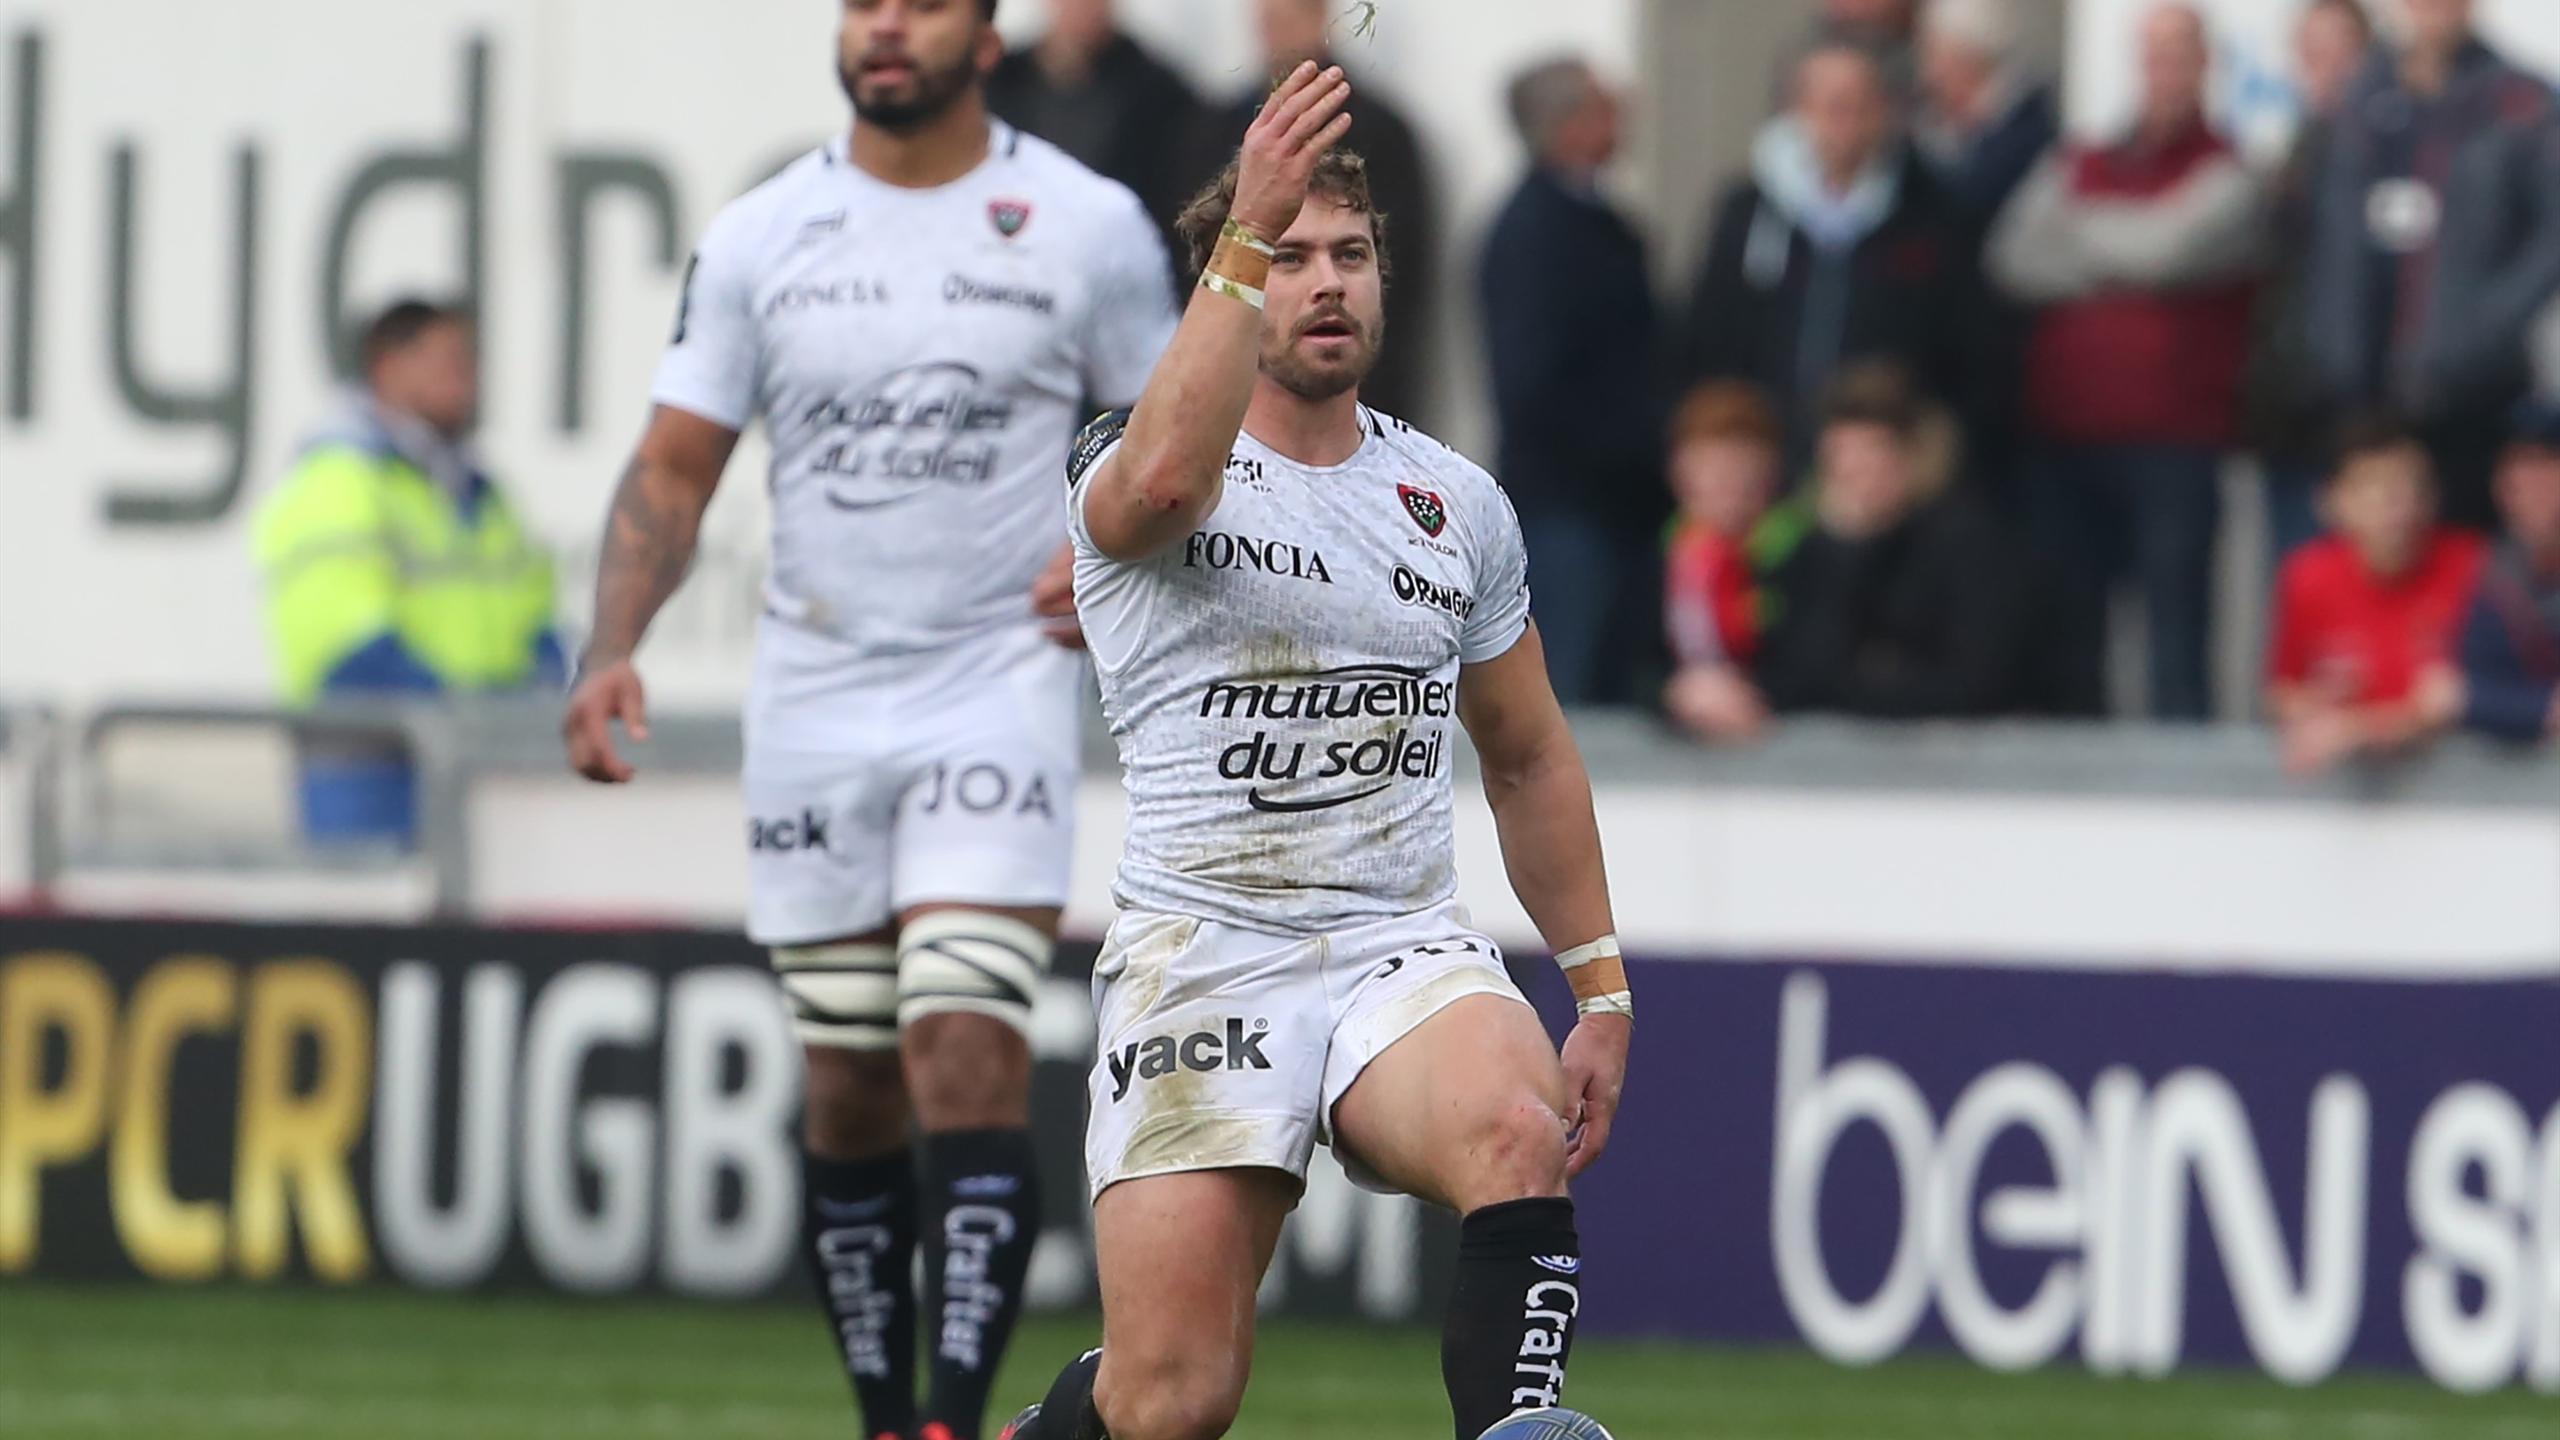 Leigh Halfpenny (Toulon) - 18 décembre 2016